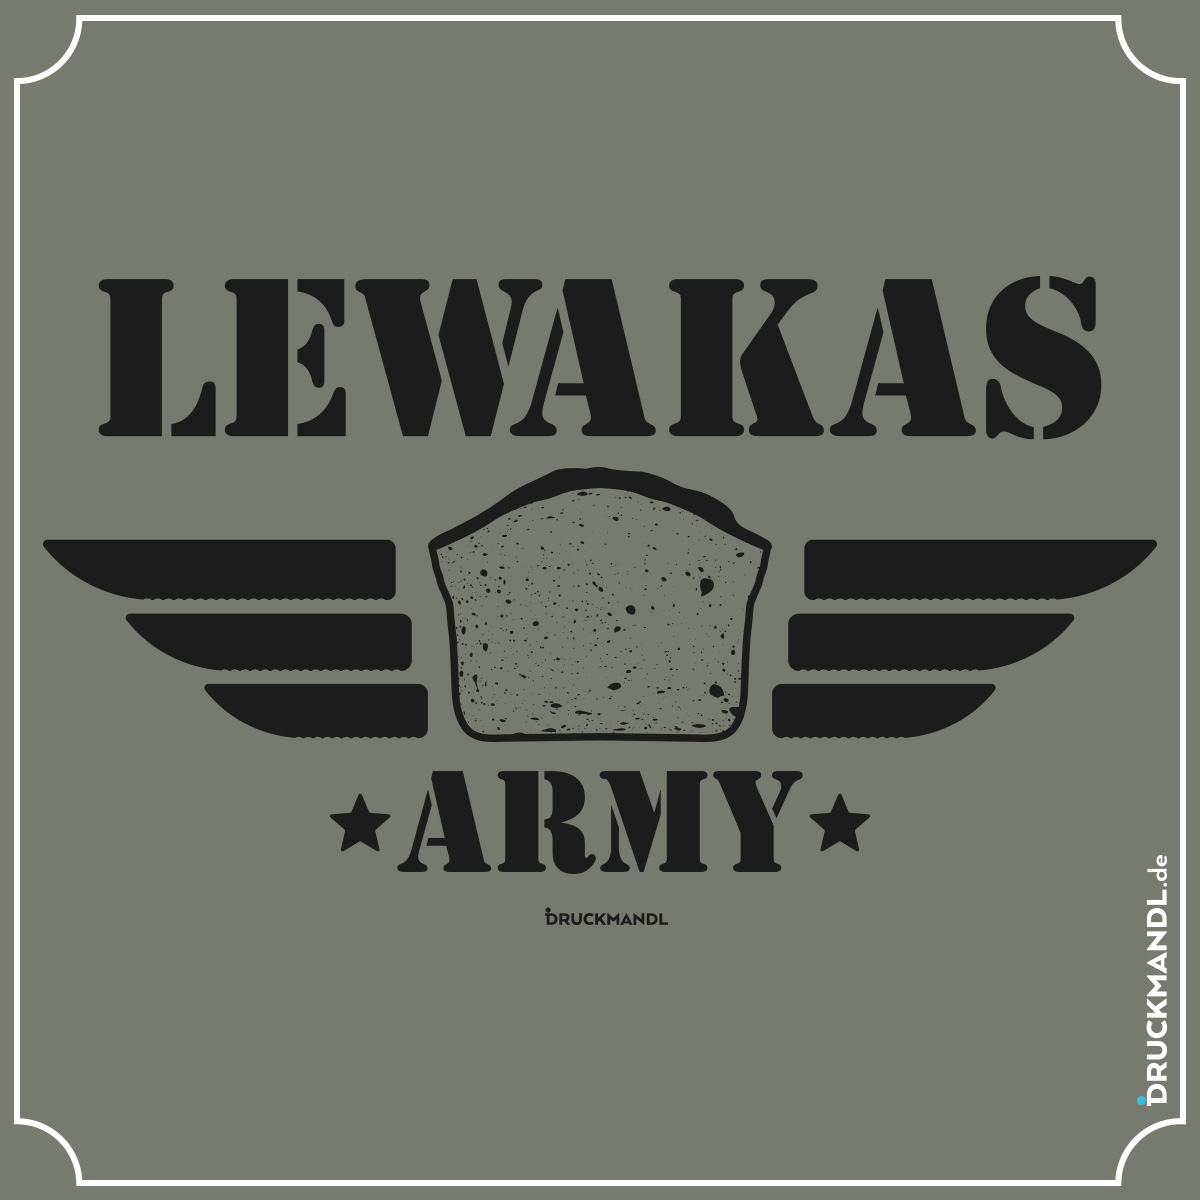 Lewakas Army - Lebakas Army